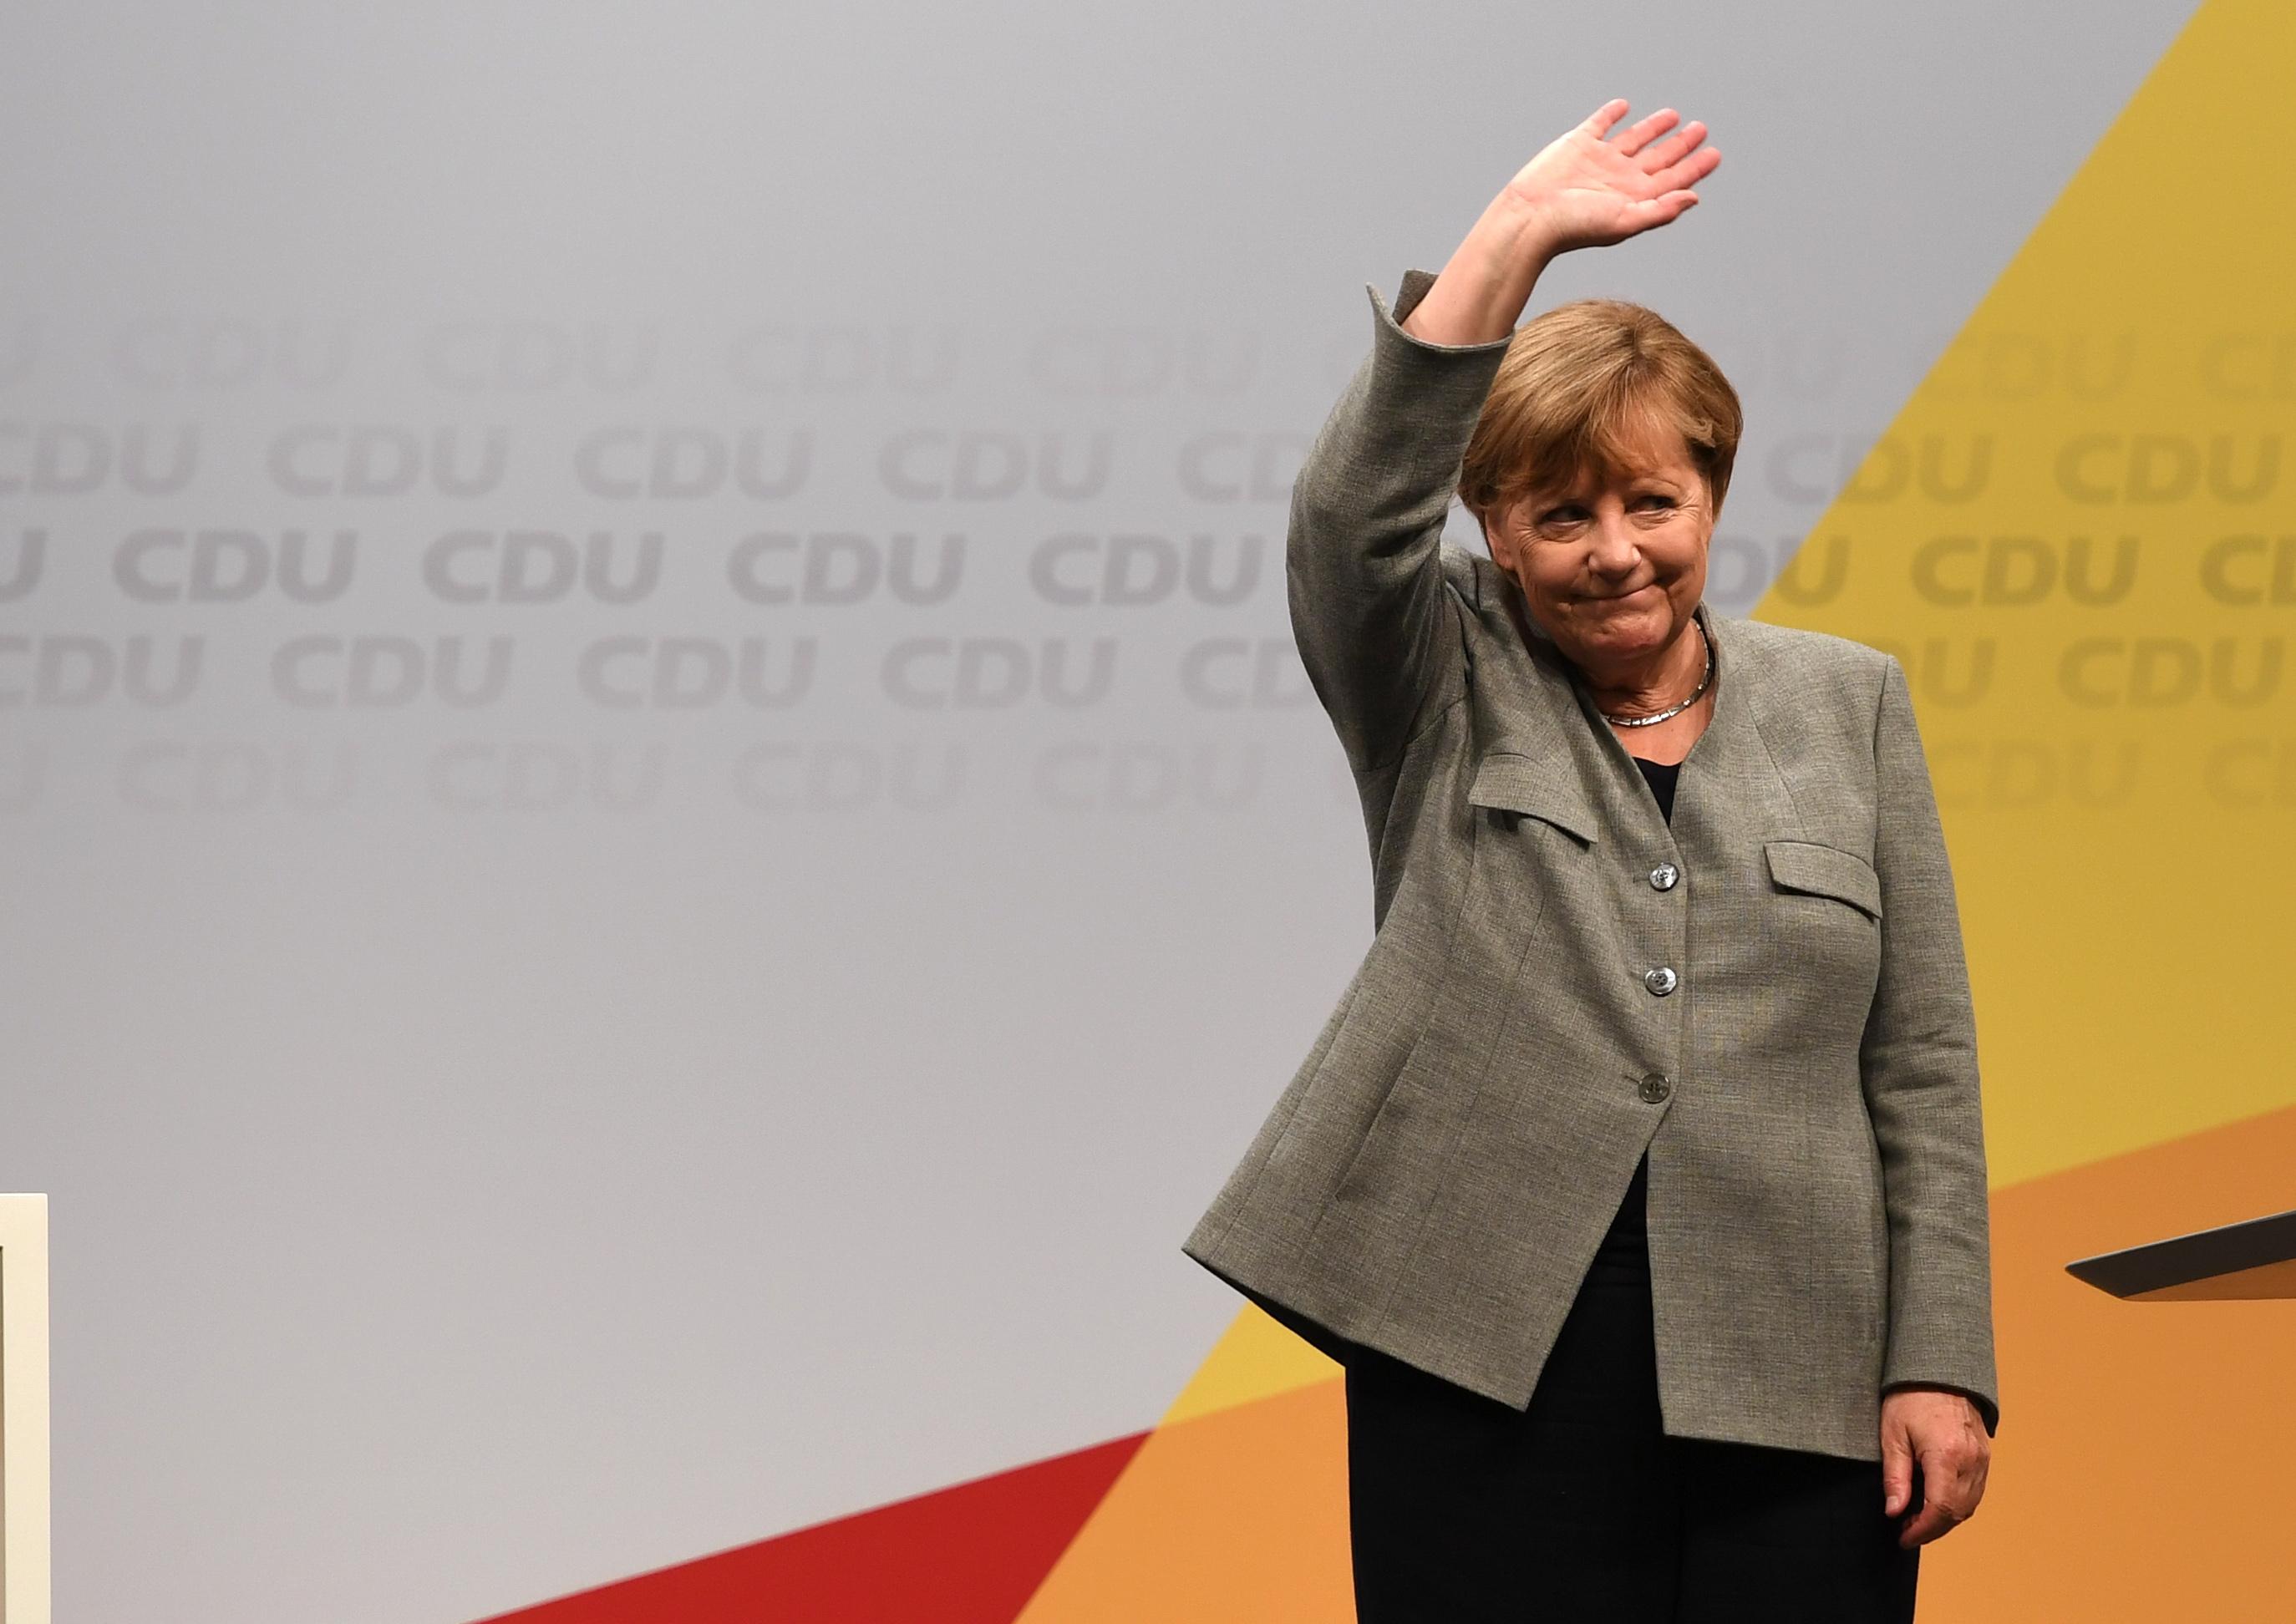 GERMANY-POLITICS-MERKEL